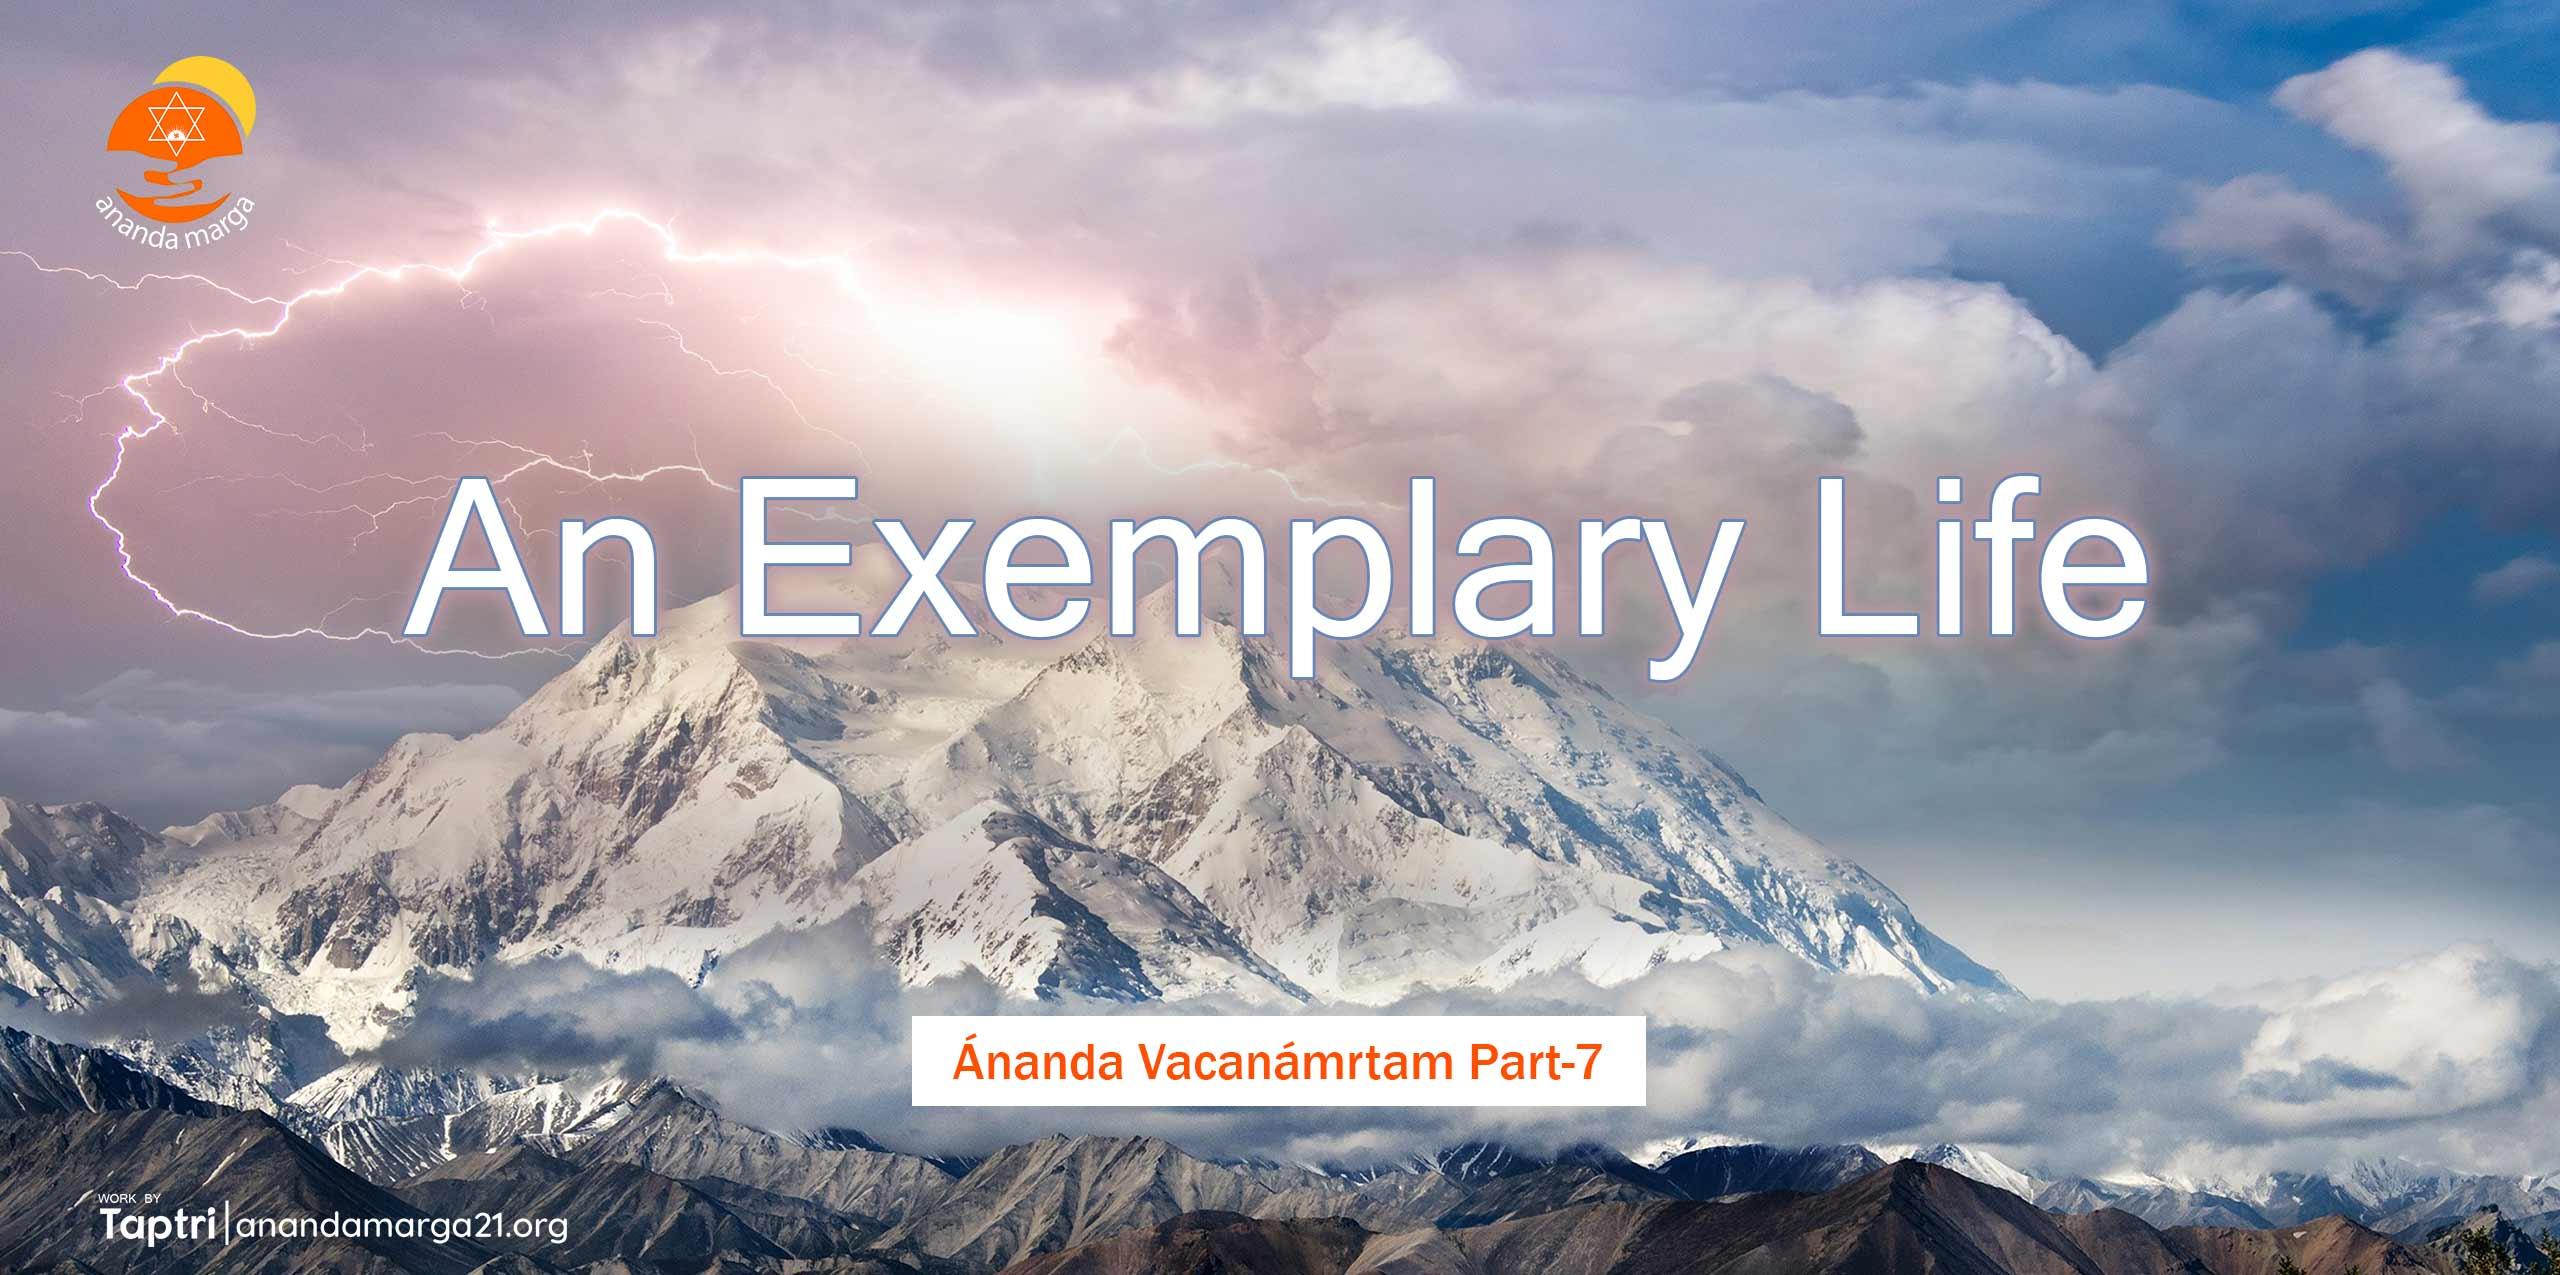 An-Exemplary-Life-Marga-Ananda-Vacanamrtm-07-anandamarga